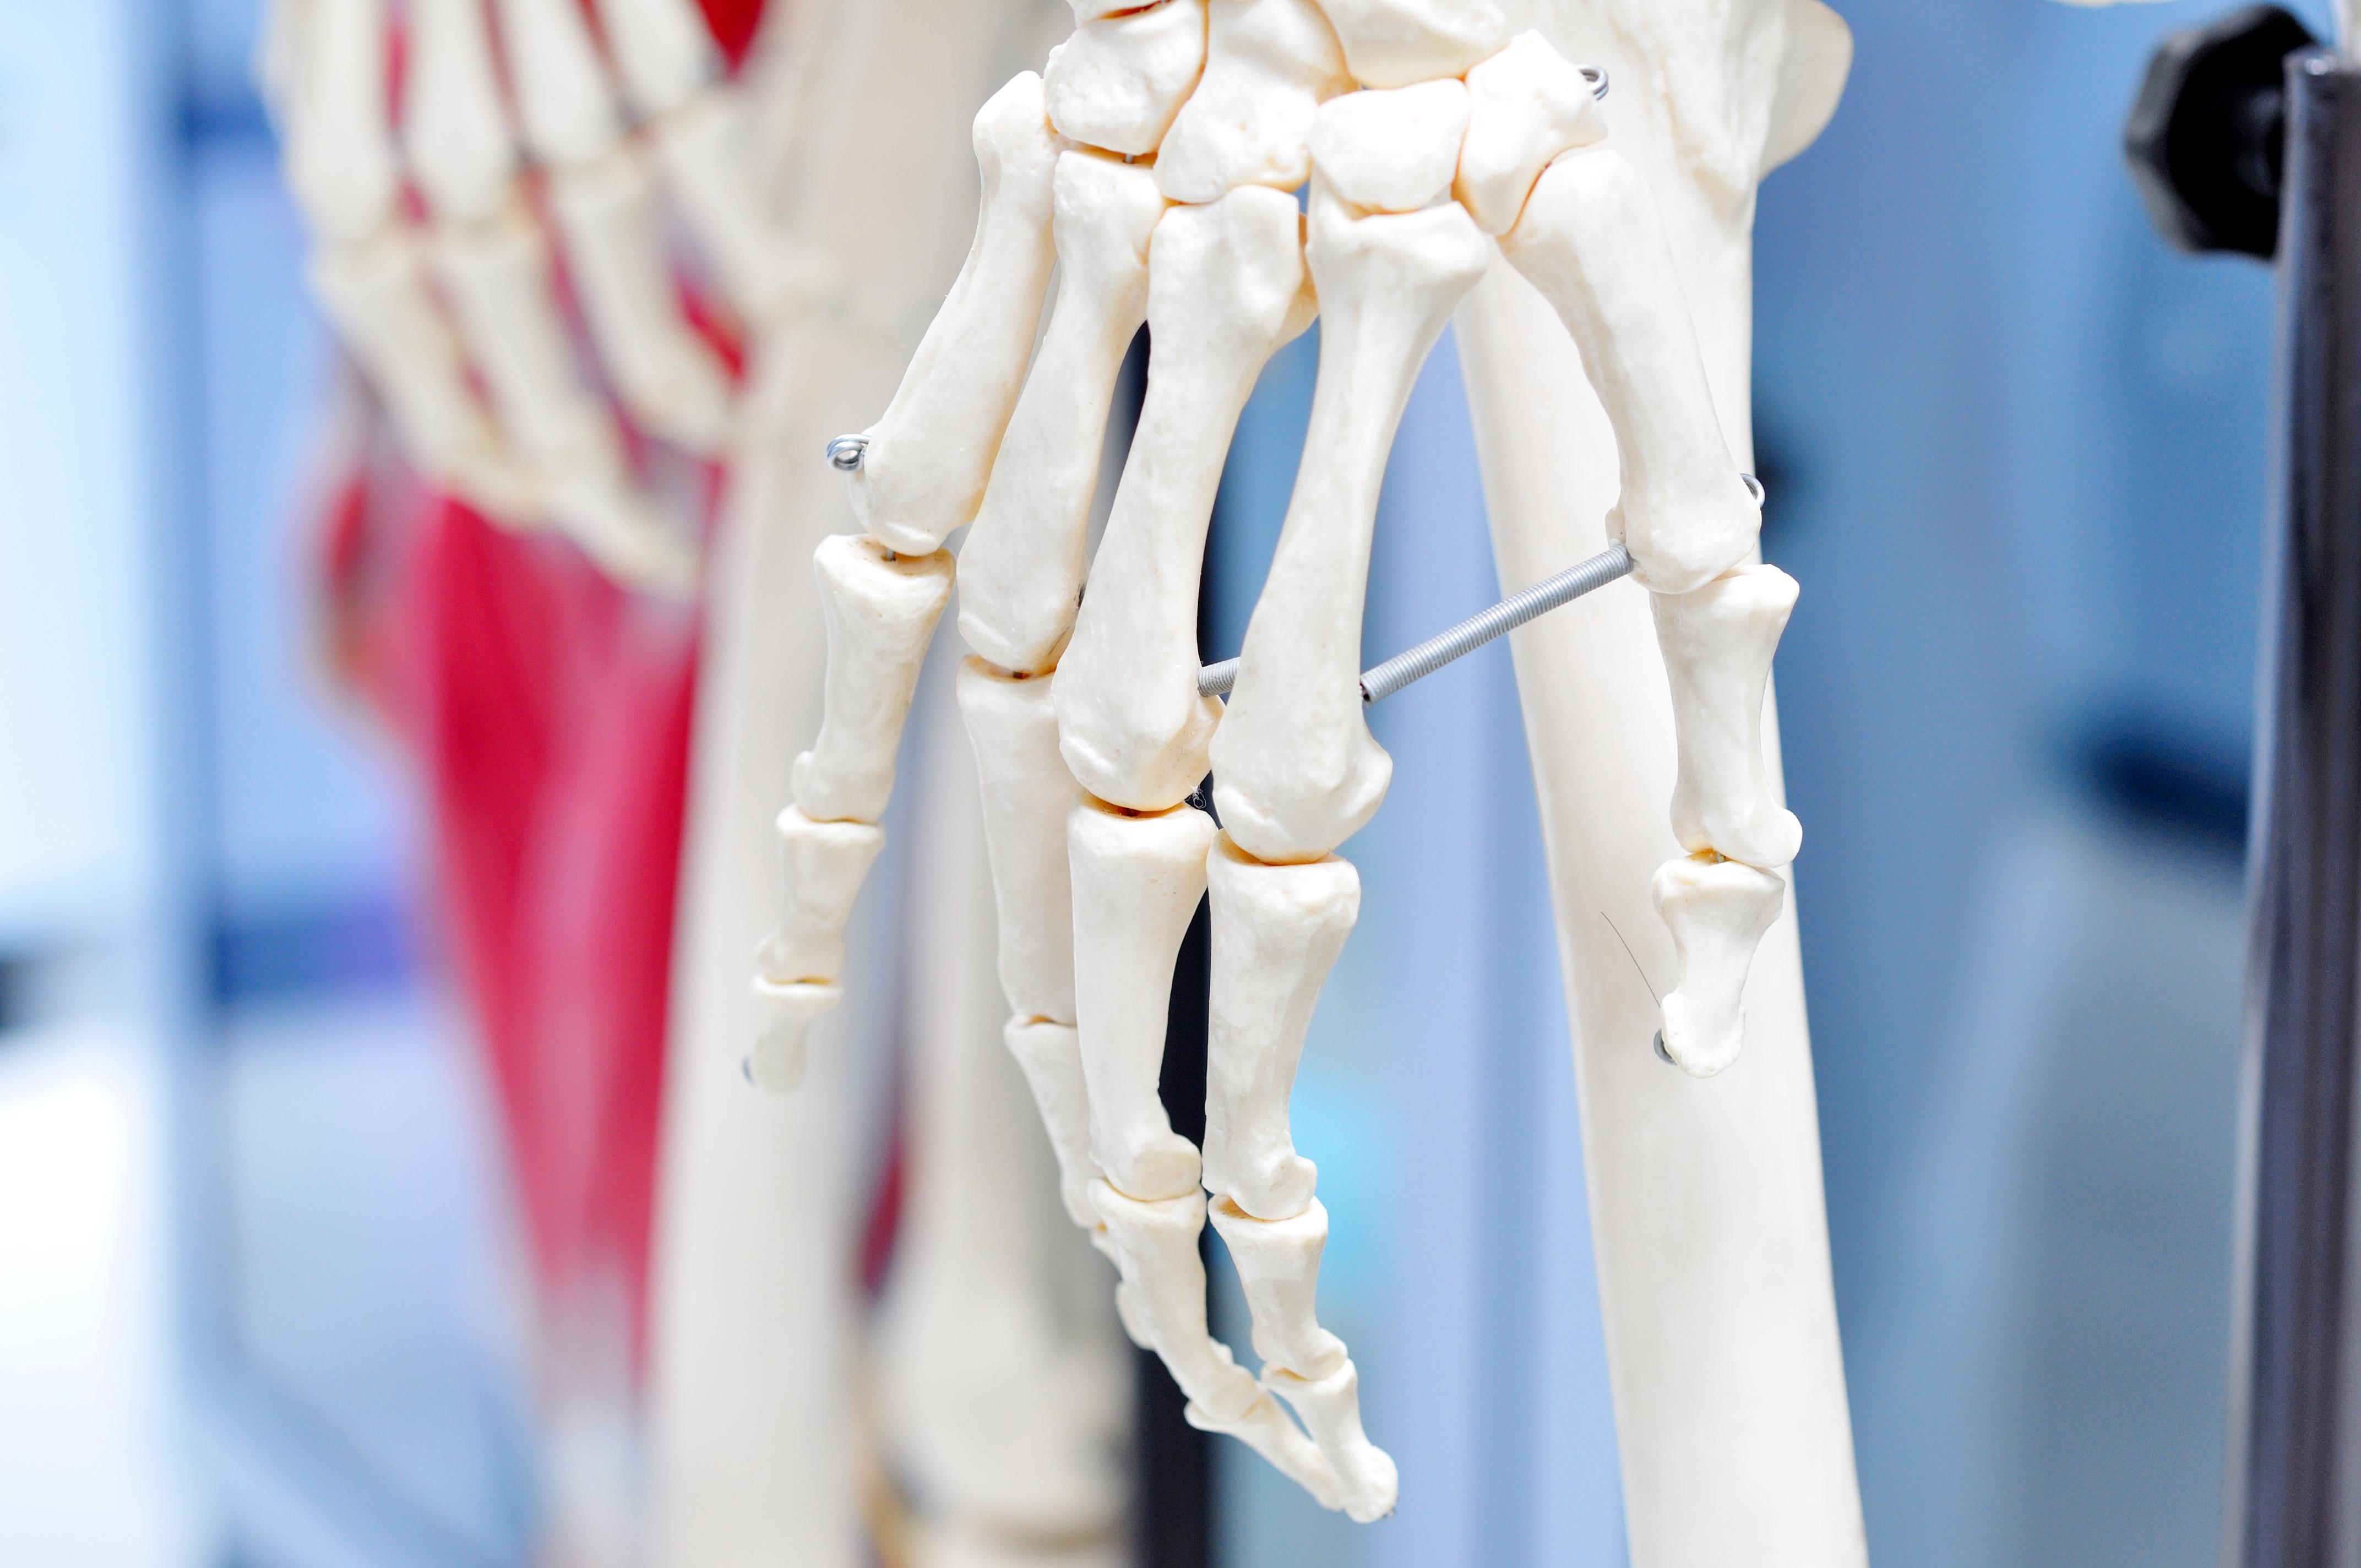 Nästan allt kalcium i kroppen lagras i ben.